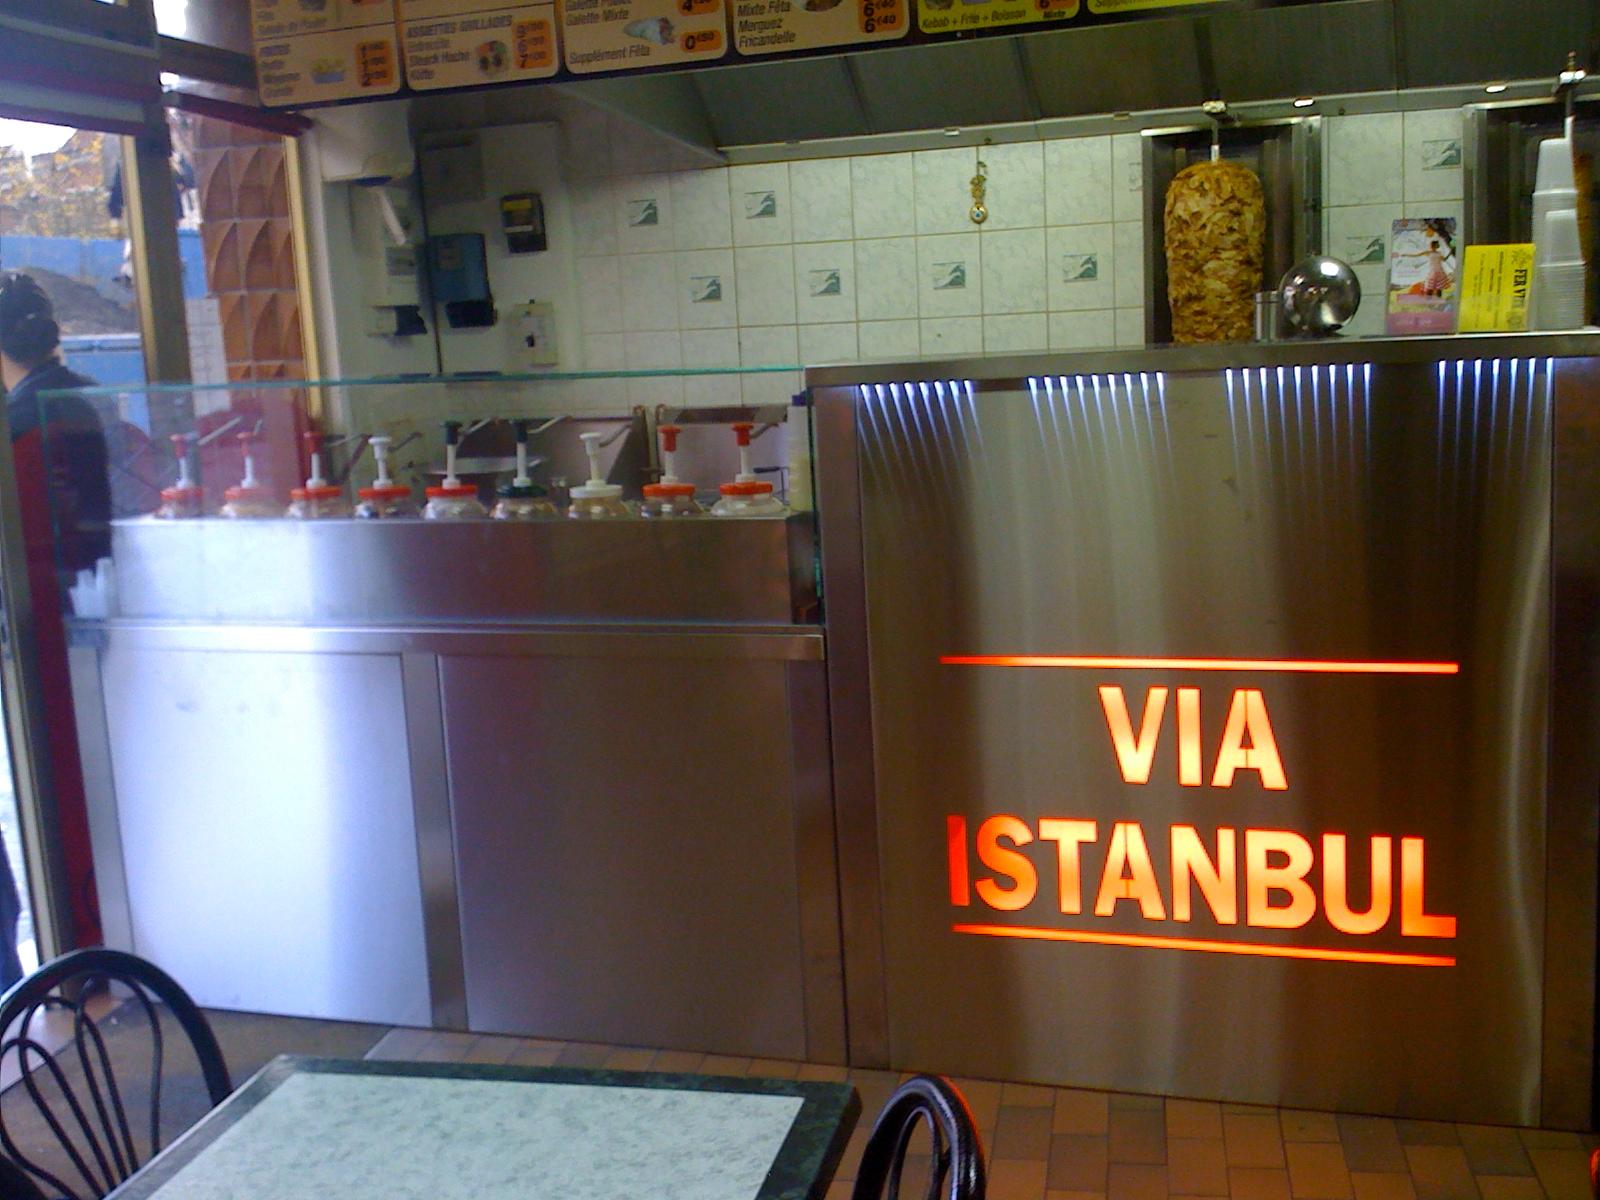 Via istanbul